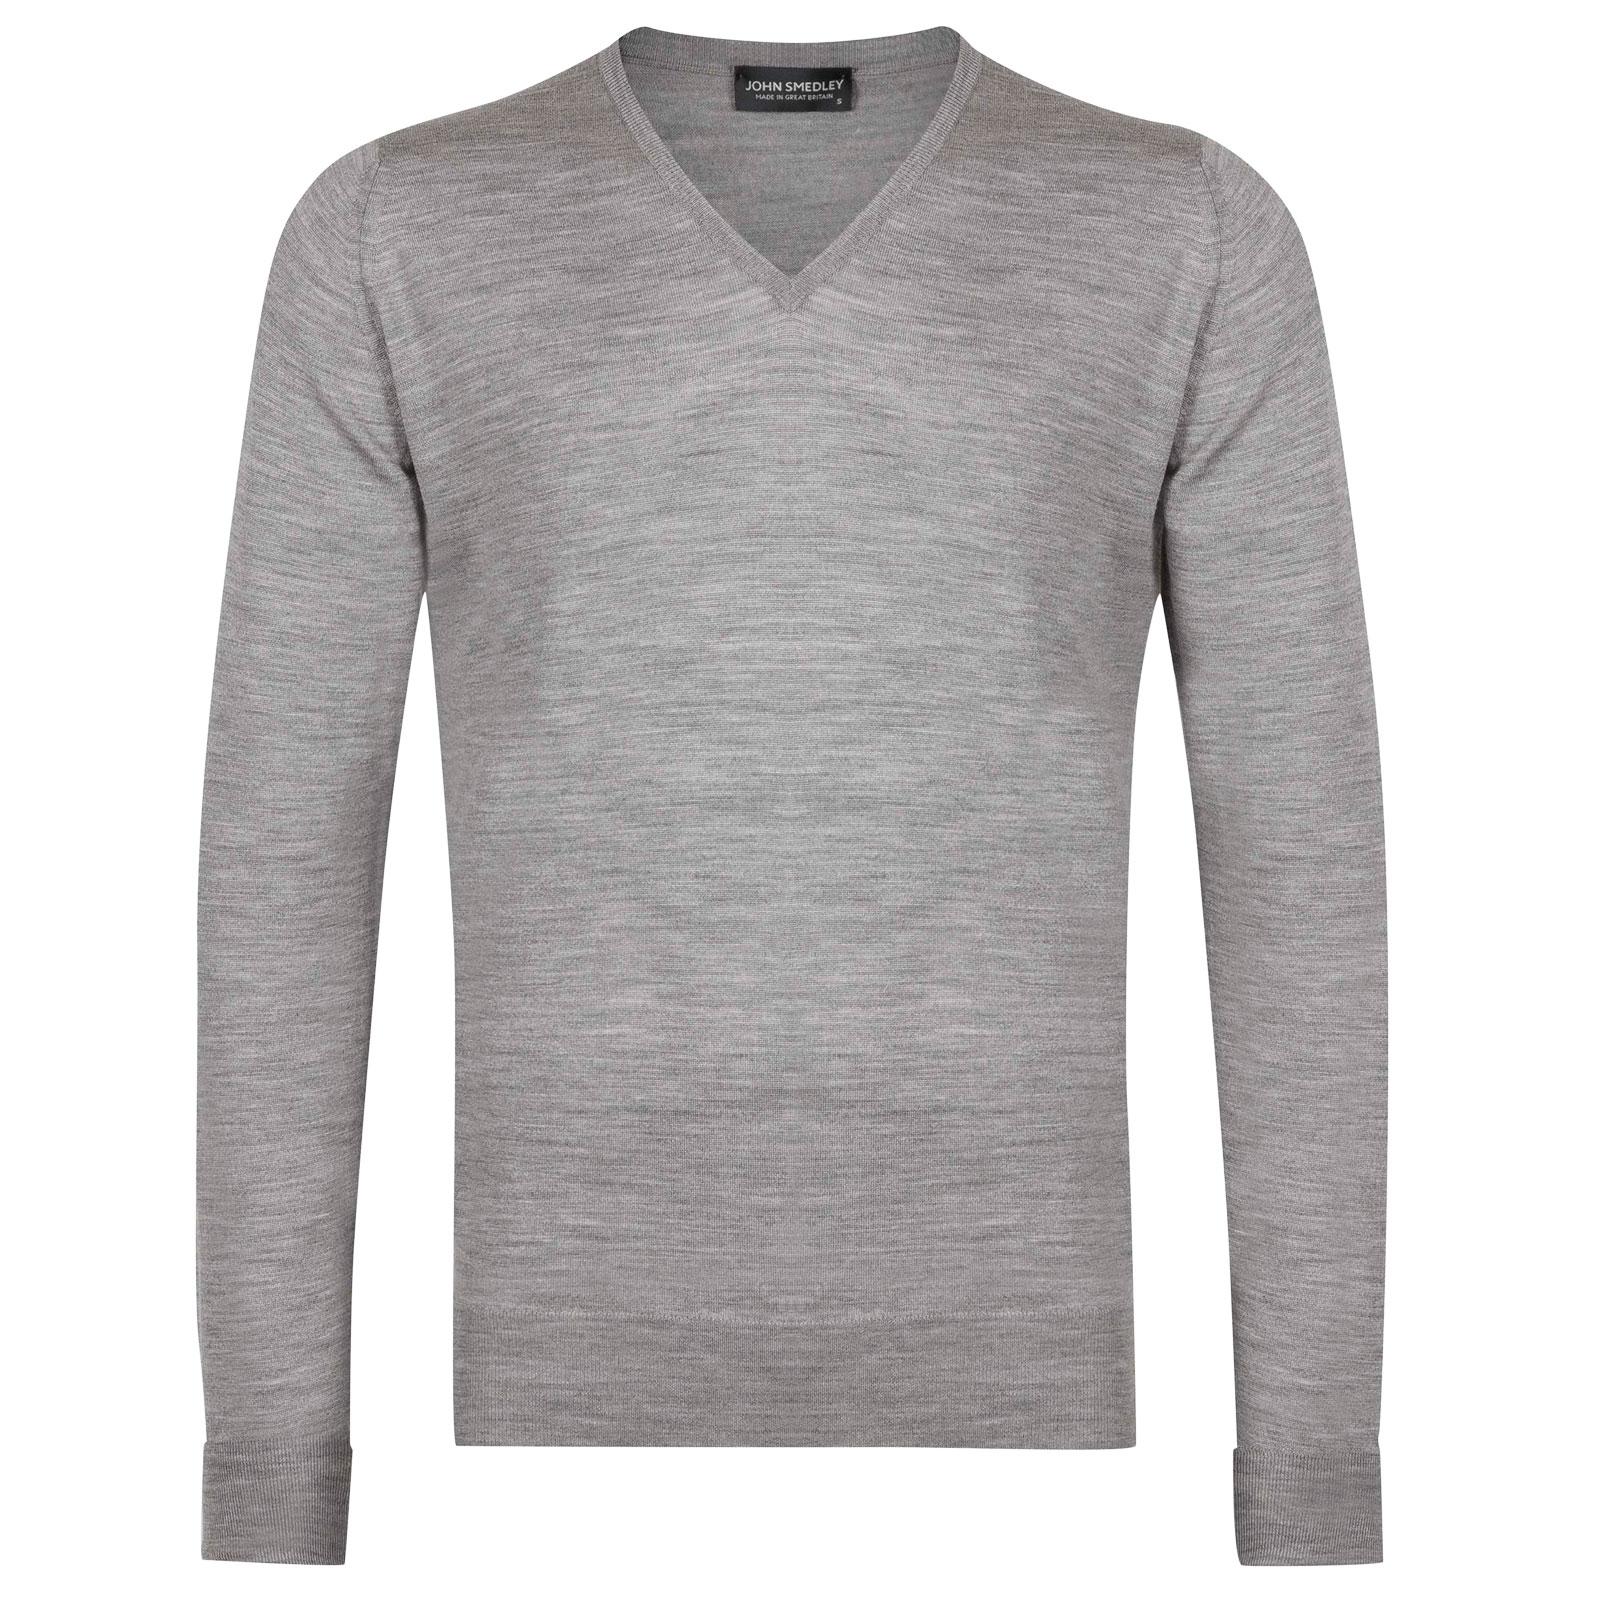 John Smedley bobby Merino Wool Pullover in Silver-S